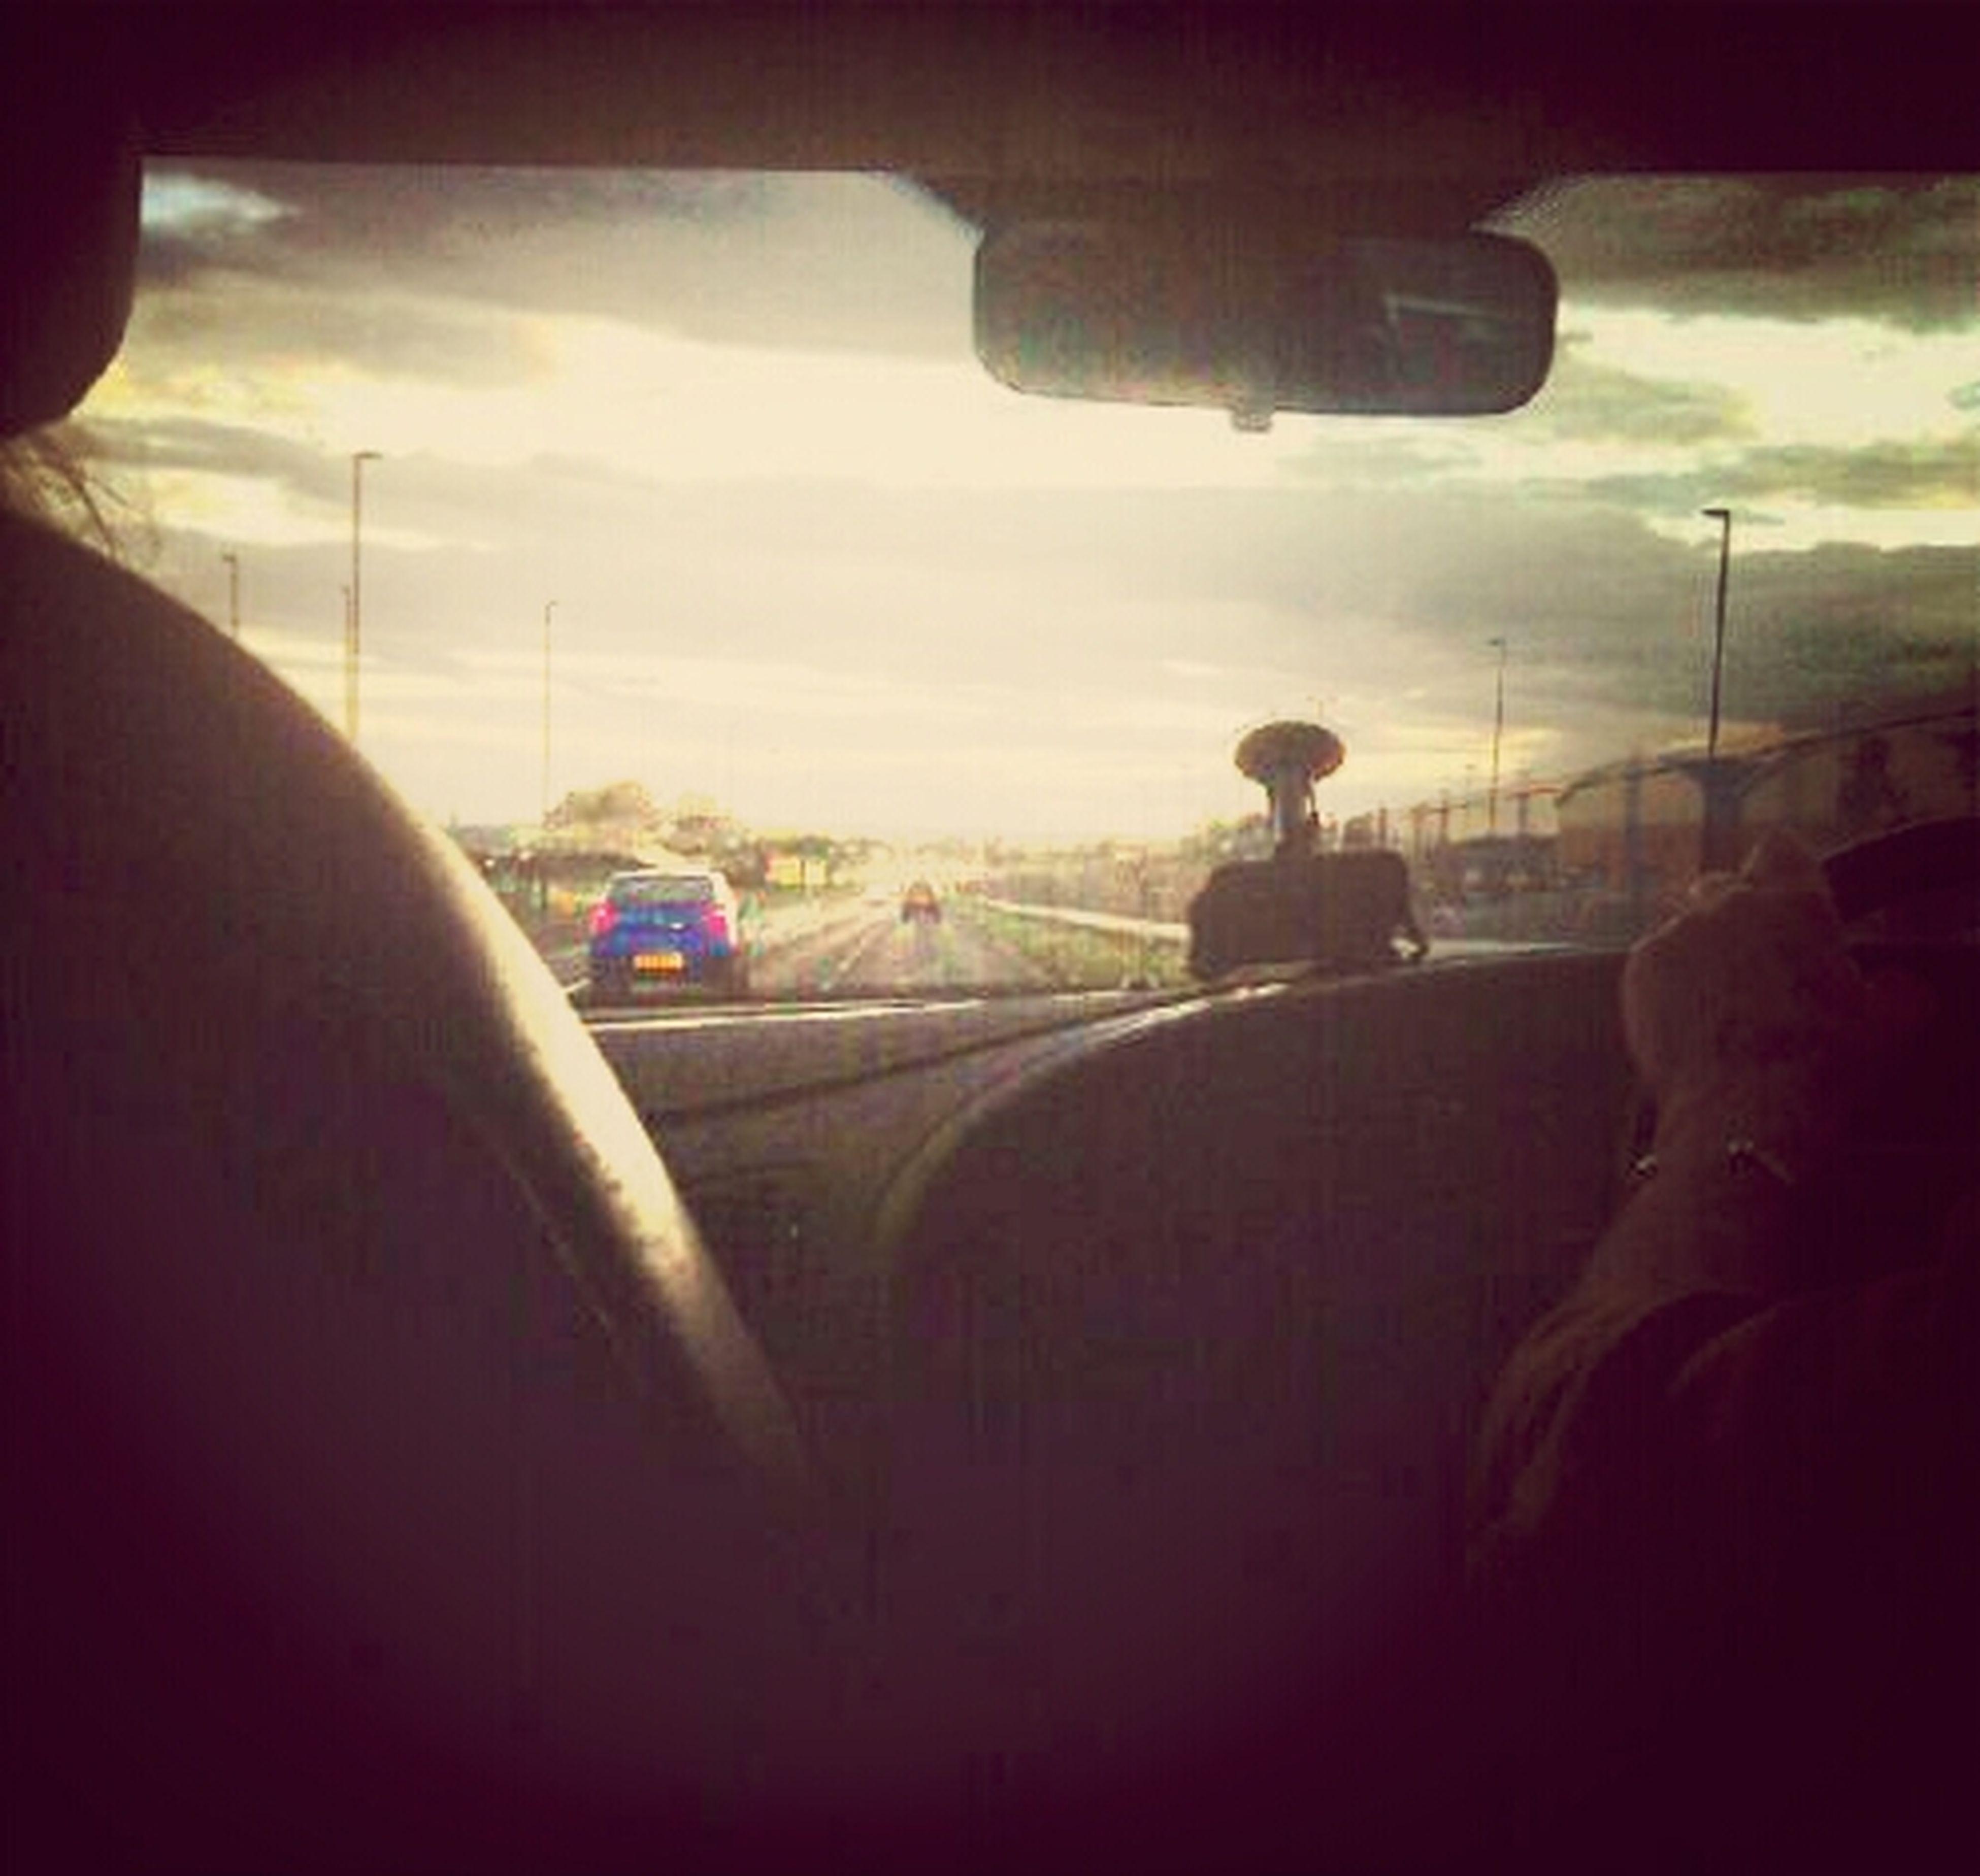 transportation, mode of transport, land vehicle, vehicle interior, car, sky, travel, cloud - sky, road, journey, window, public transportation, street, cloud, windshield, transparent, indoors, vehicle seat, on the move